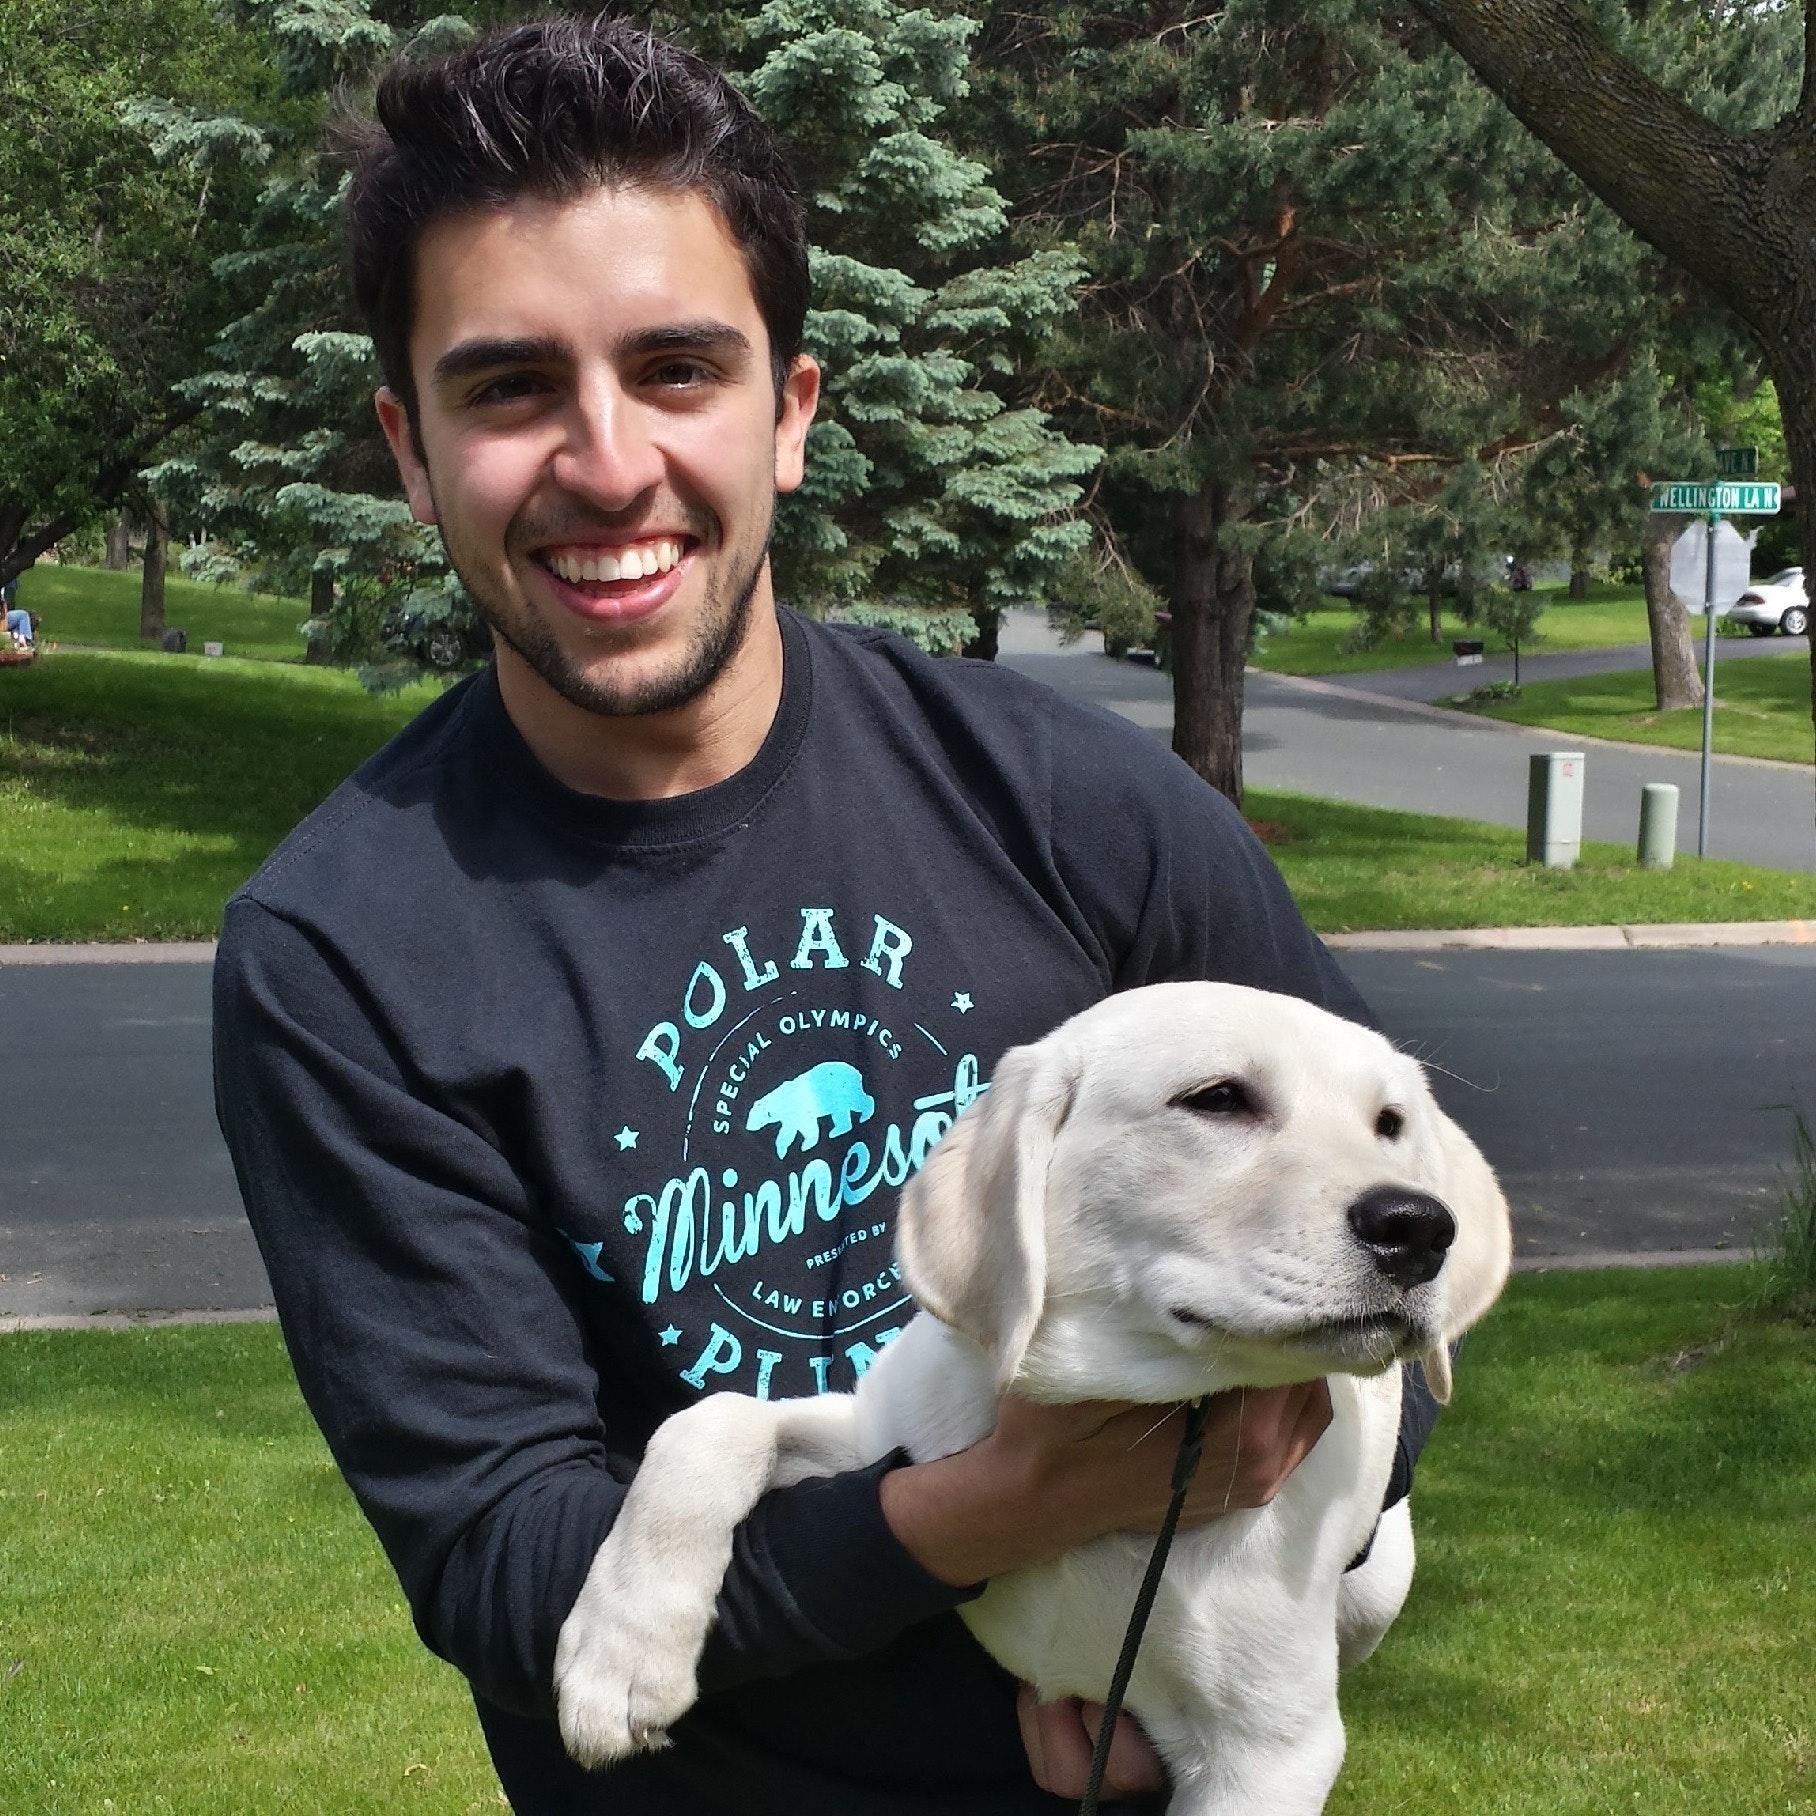 Luis's dog boarding